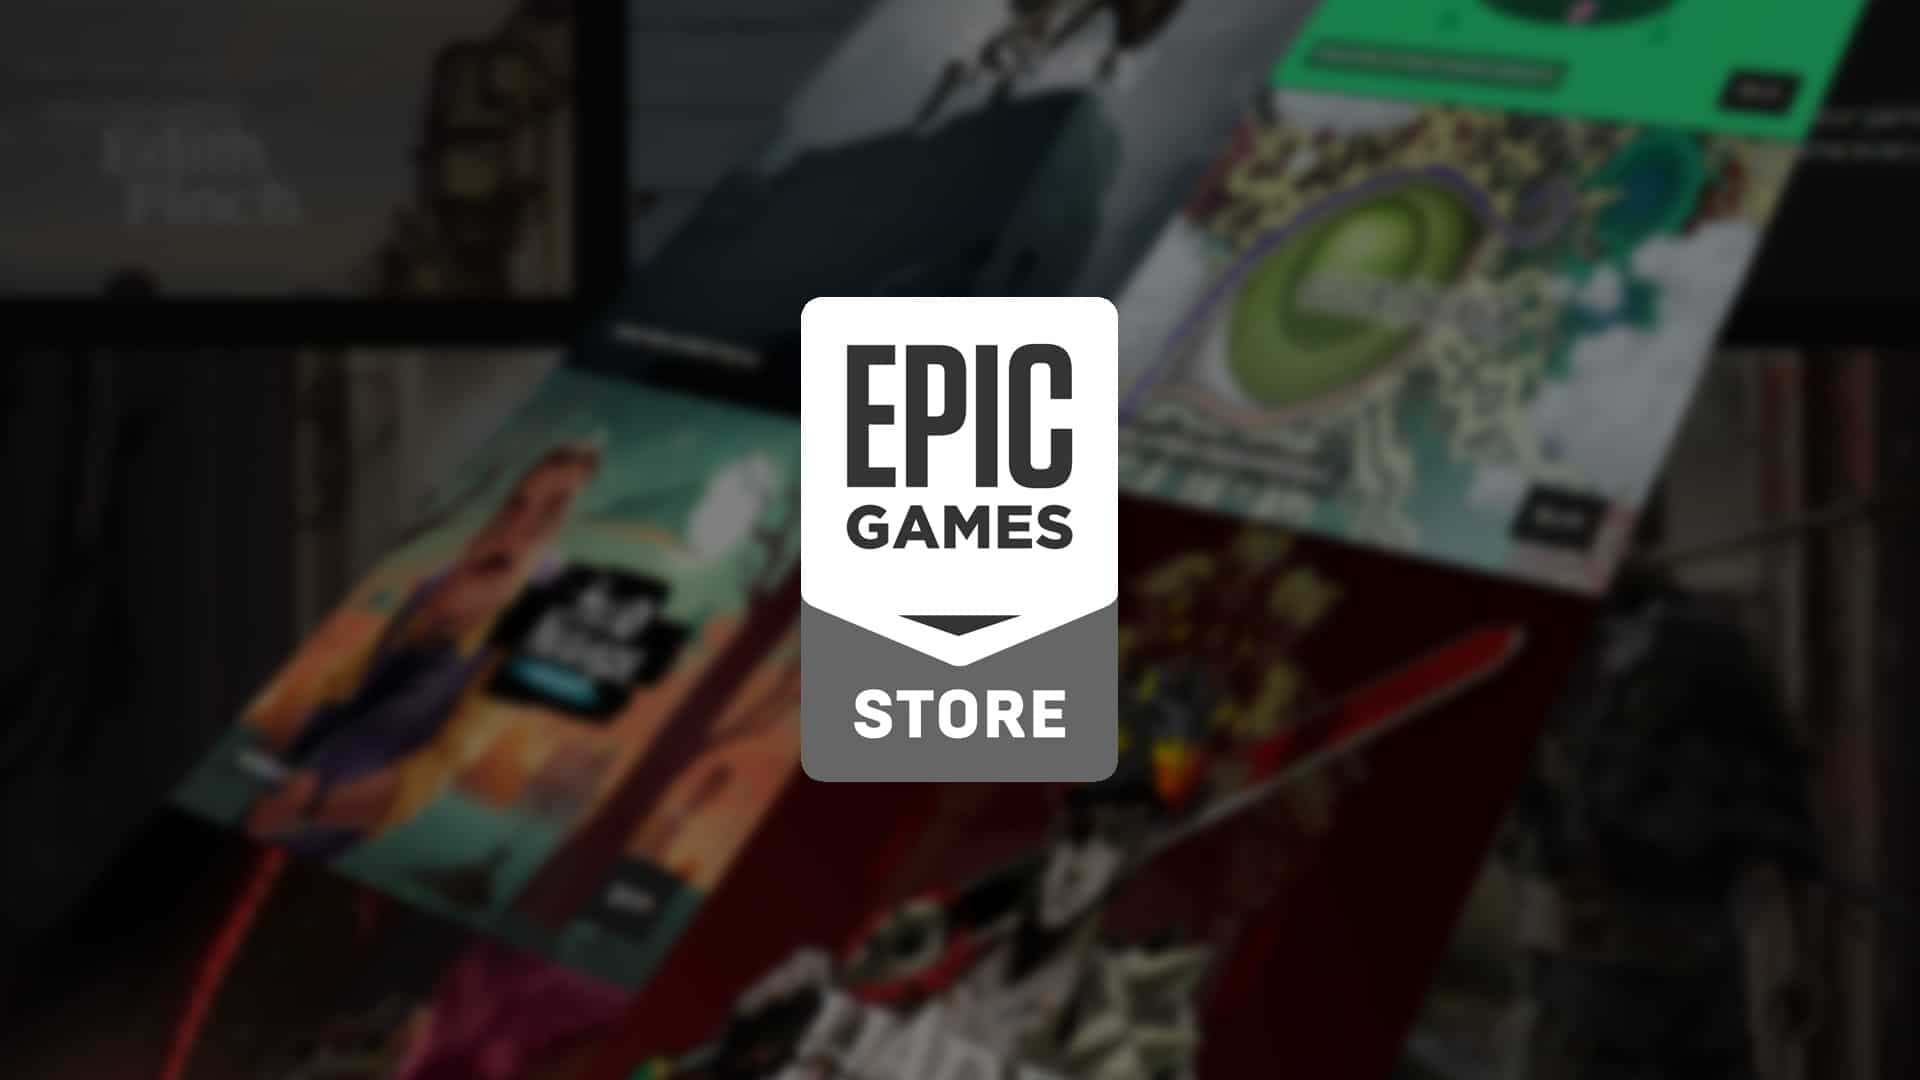 Epic Games Store illustration